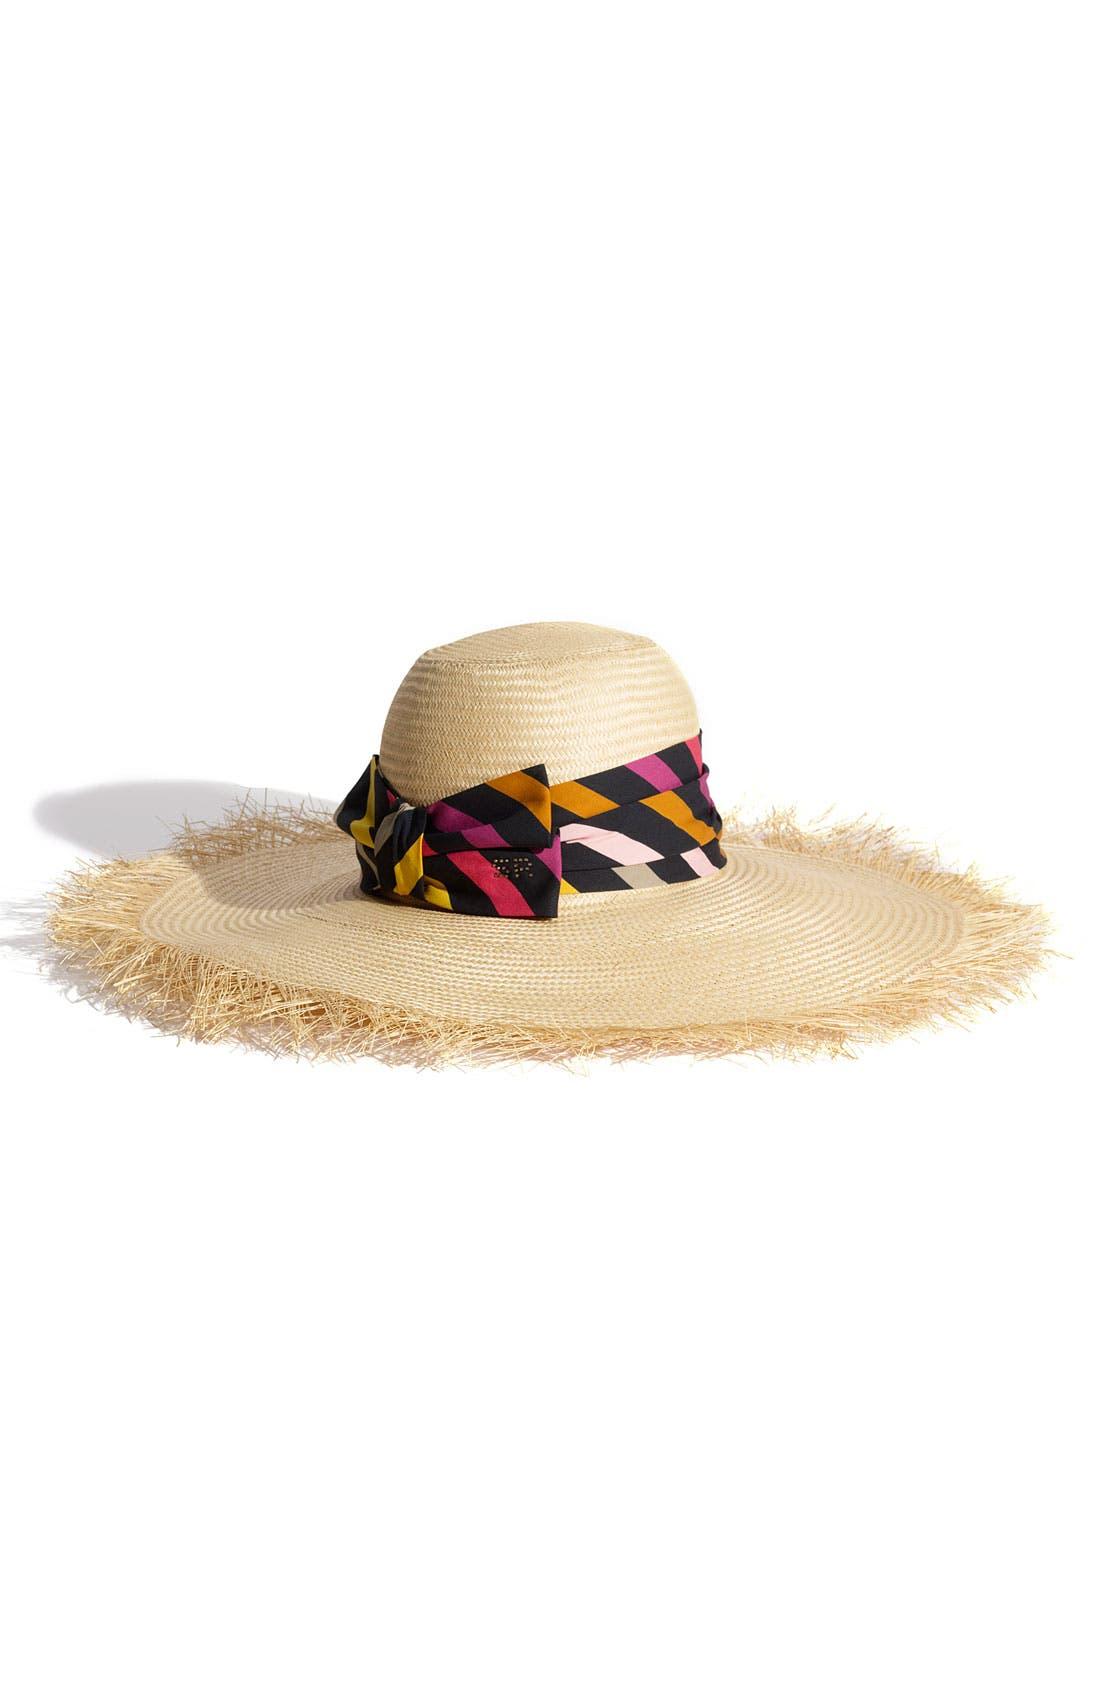 Main Image - Sonia Rykiel Straw Sun Hat